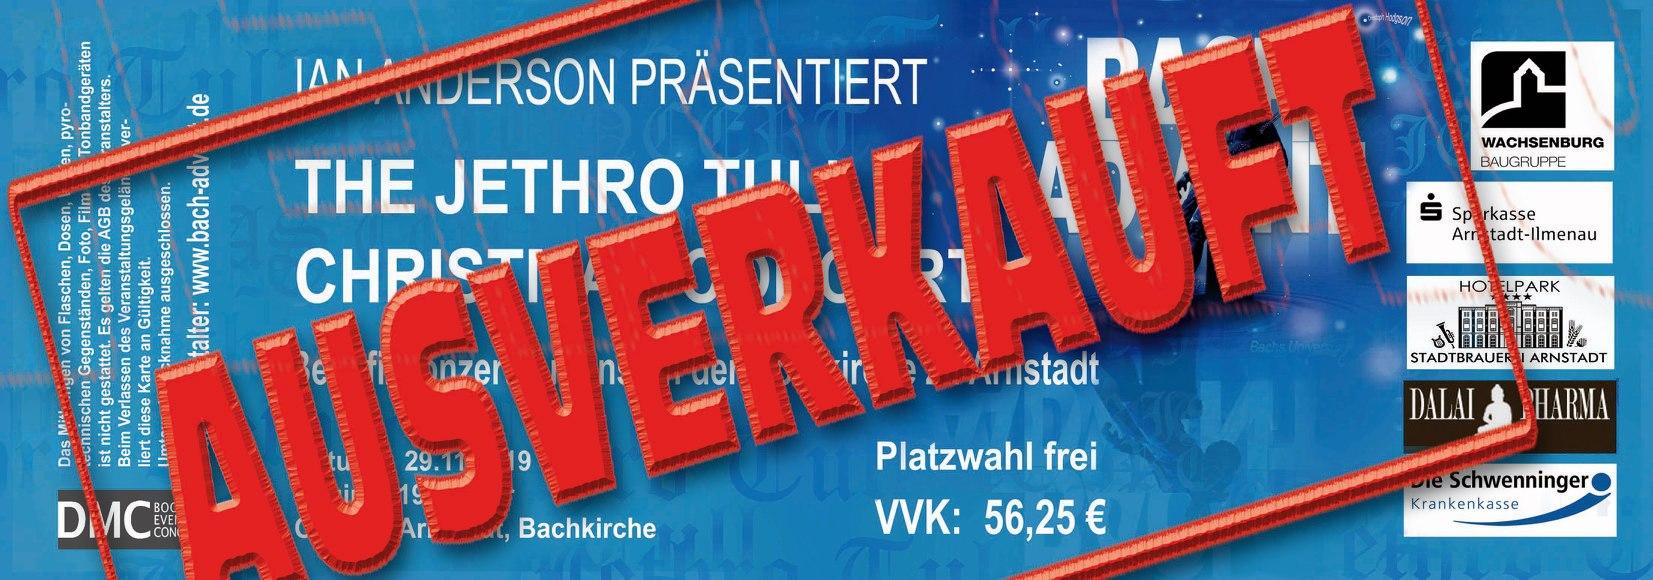 << The Jethro Tull Christmas Concert >> ist ausverkauft!